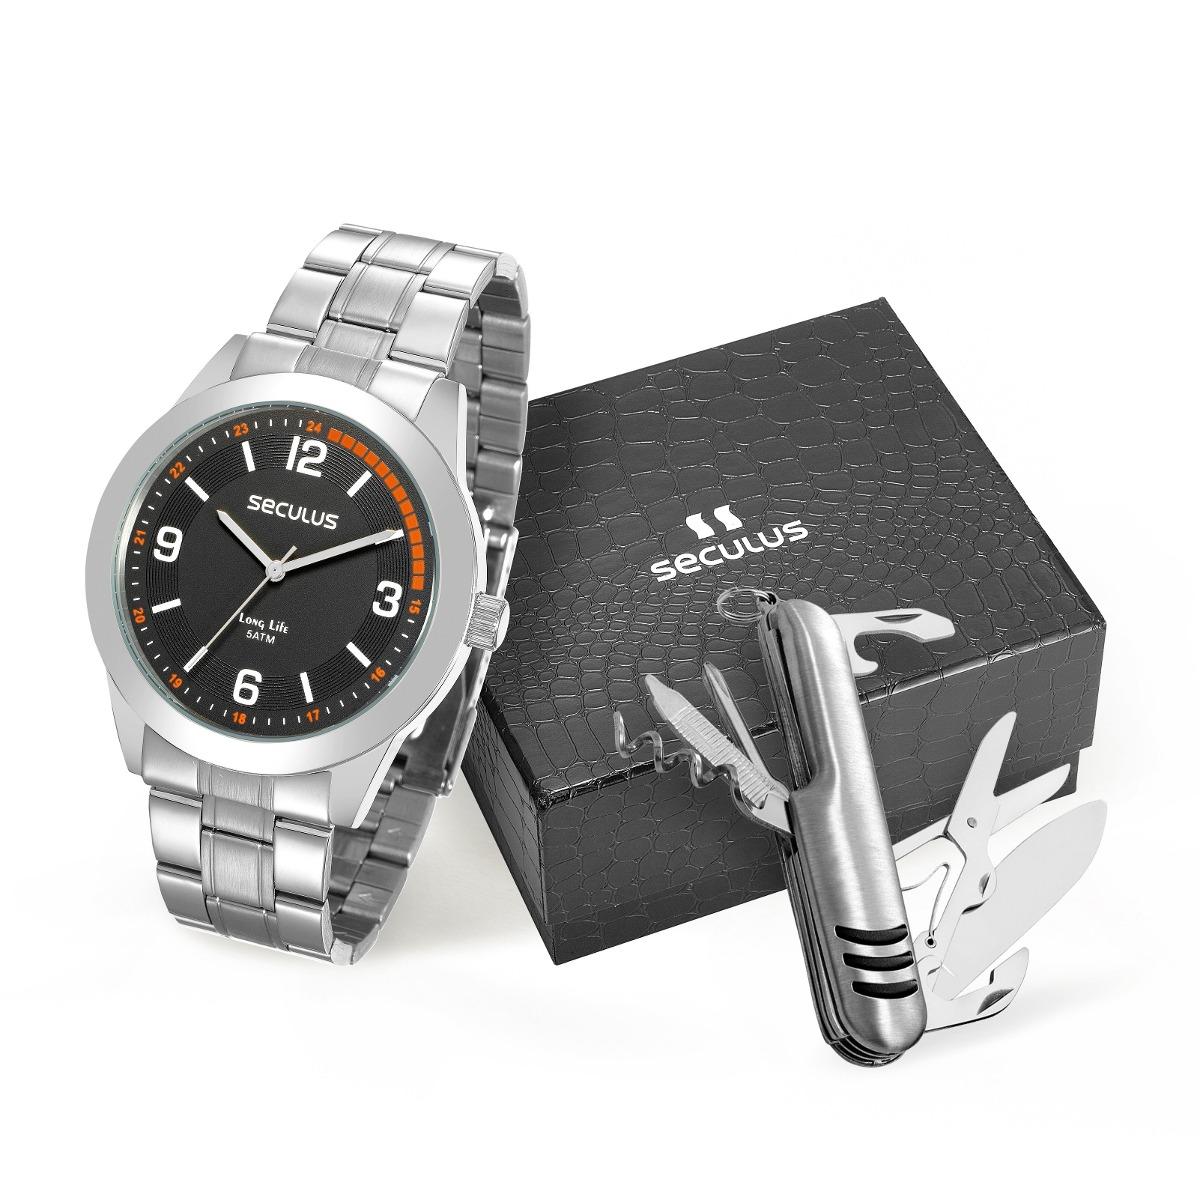 aa5b52962 kit relógio seculus masculino 28885g0svna2k1 + canivete. Carregando zoom.